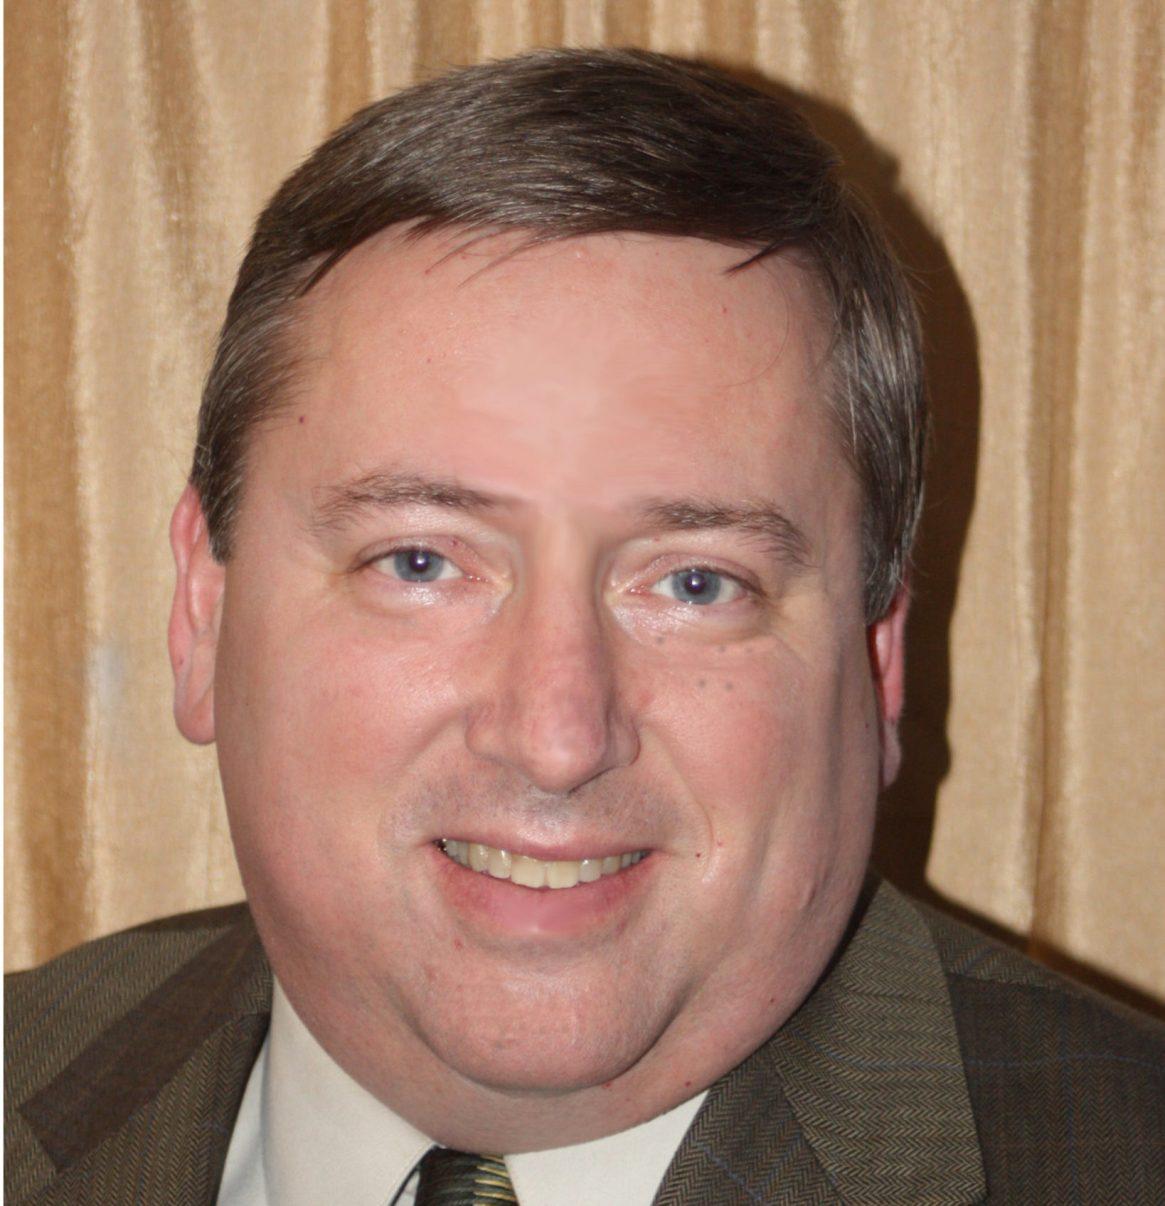 Elder Kory Schutz